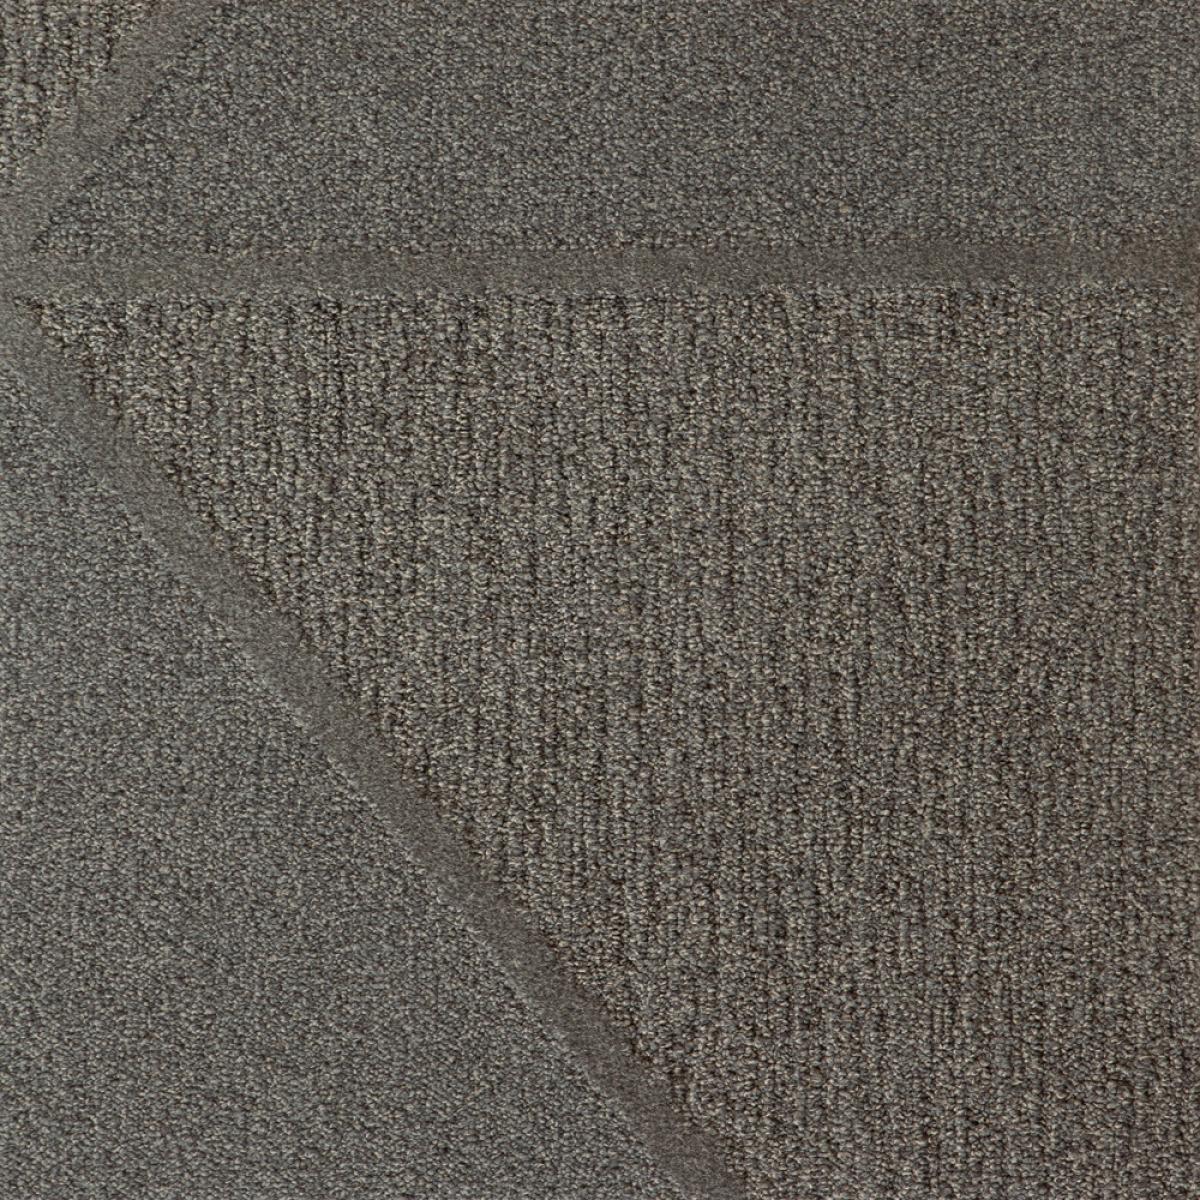 Katalog Kobercov 253 Ch čtverců Milliken Clerkenwell Ec1